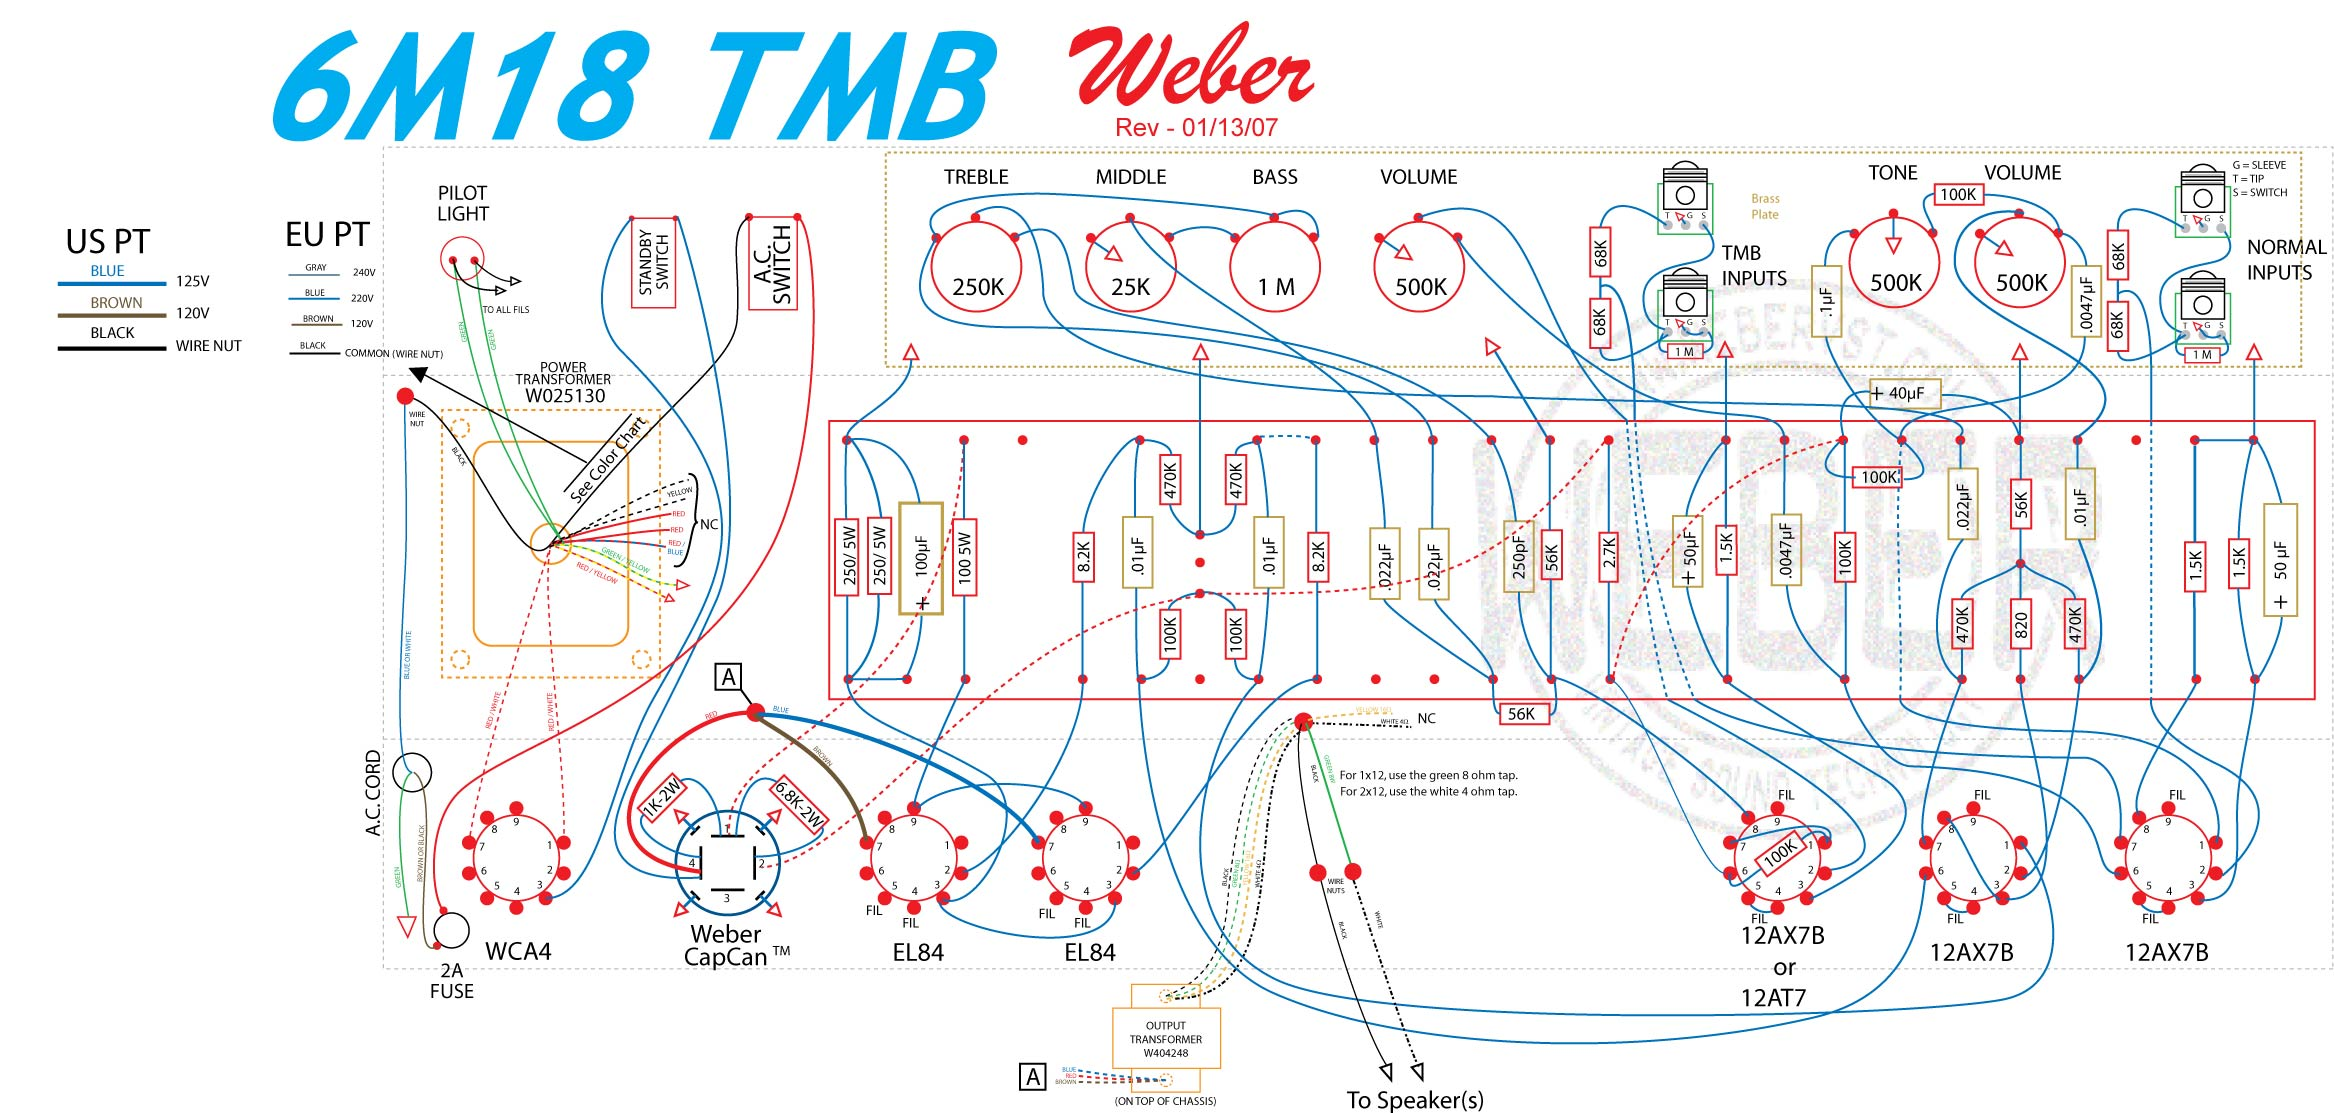 Elenco dei Kit di ampli a valvole con relativi link - 01 ... on marshall wiring device, marshall tractor, marshall cabinets diagram,